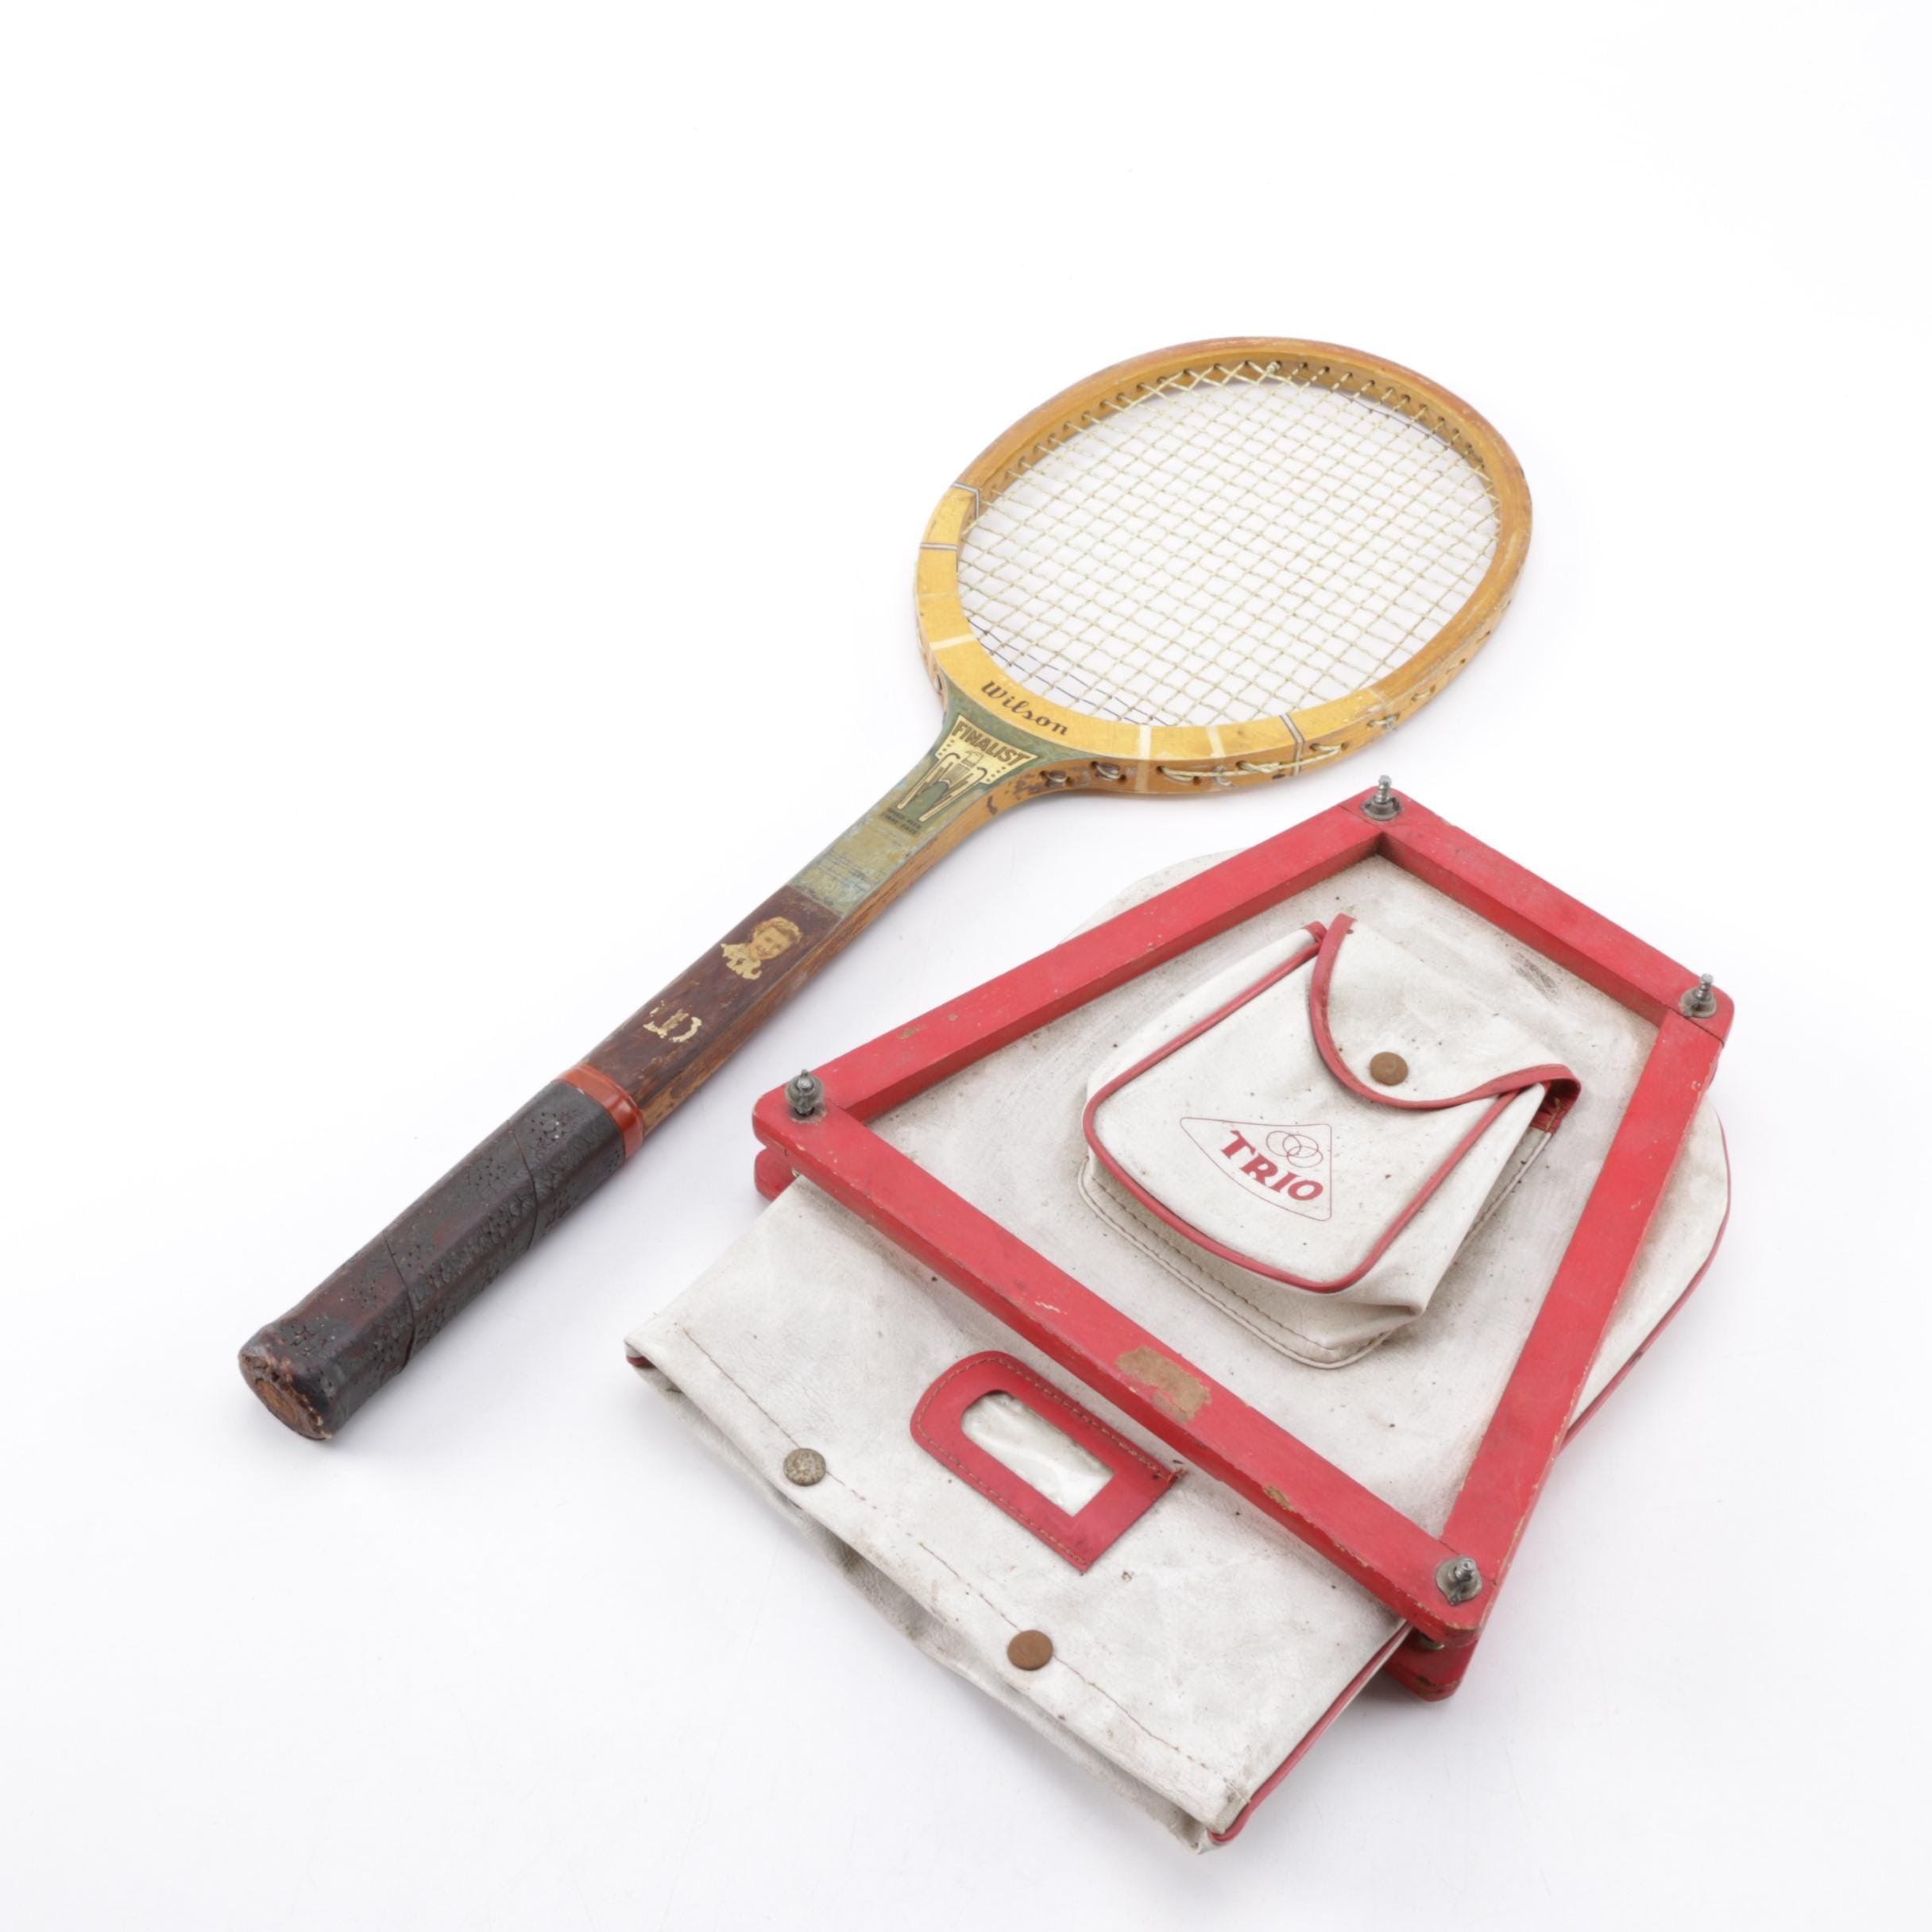 Wilson Finalist Tennis Racket with Case